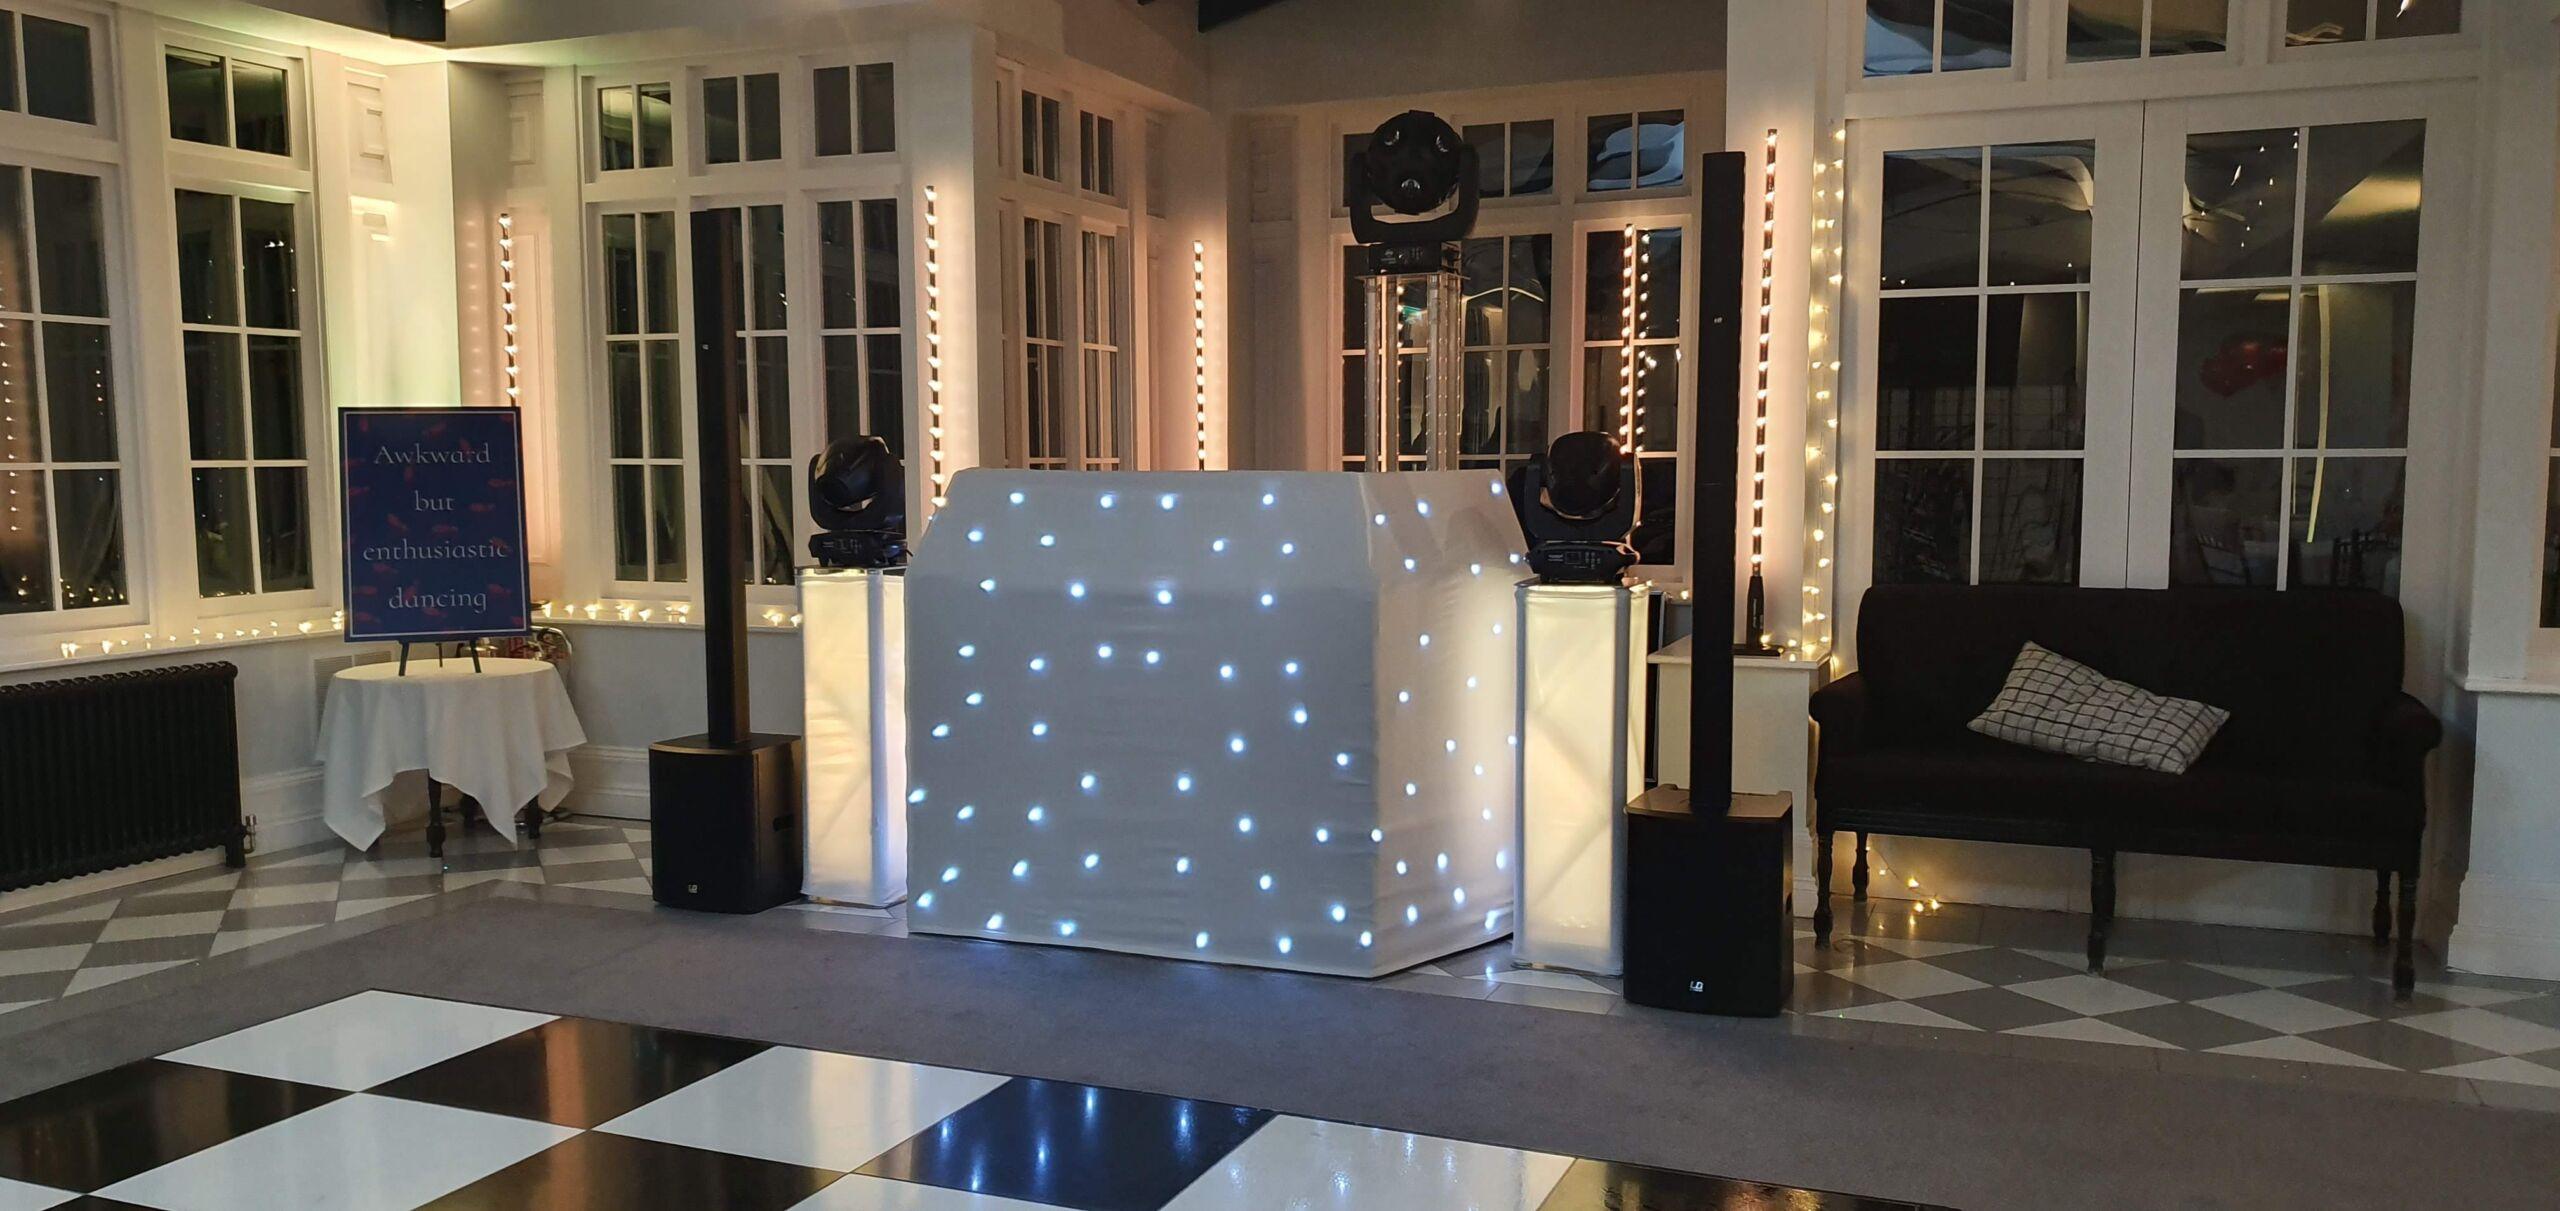 Wedding disco at Swynford Manor, Suffolk, Cambridgeshire with white starlit DJ booth